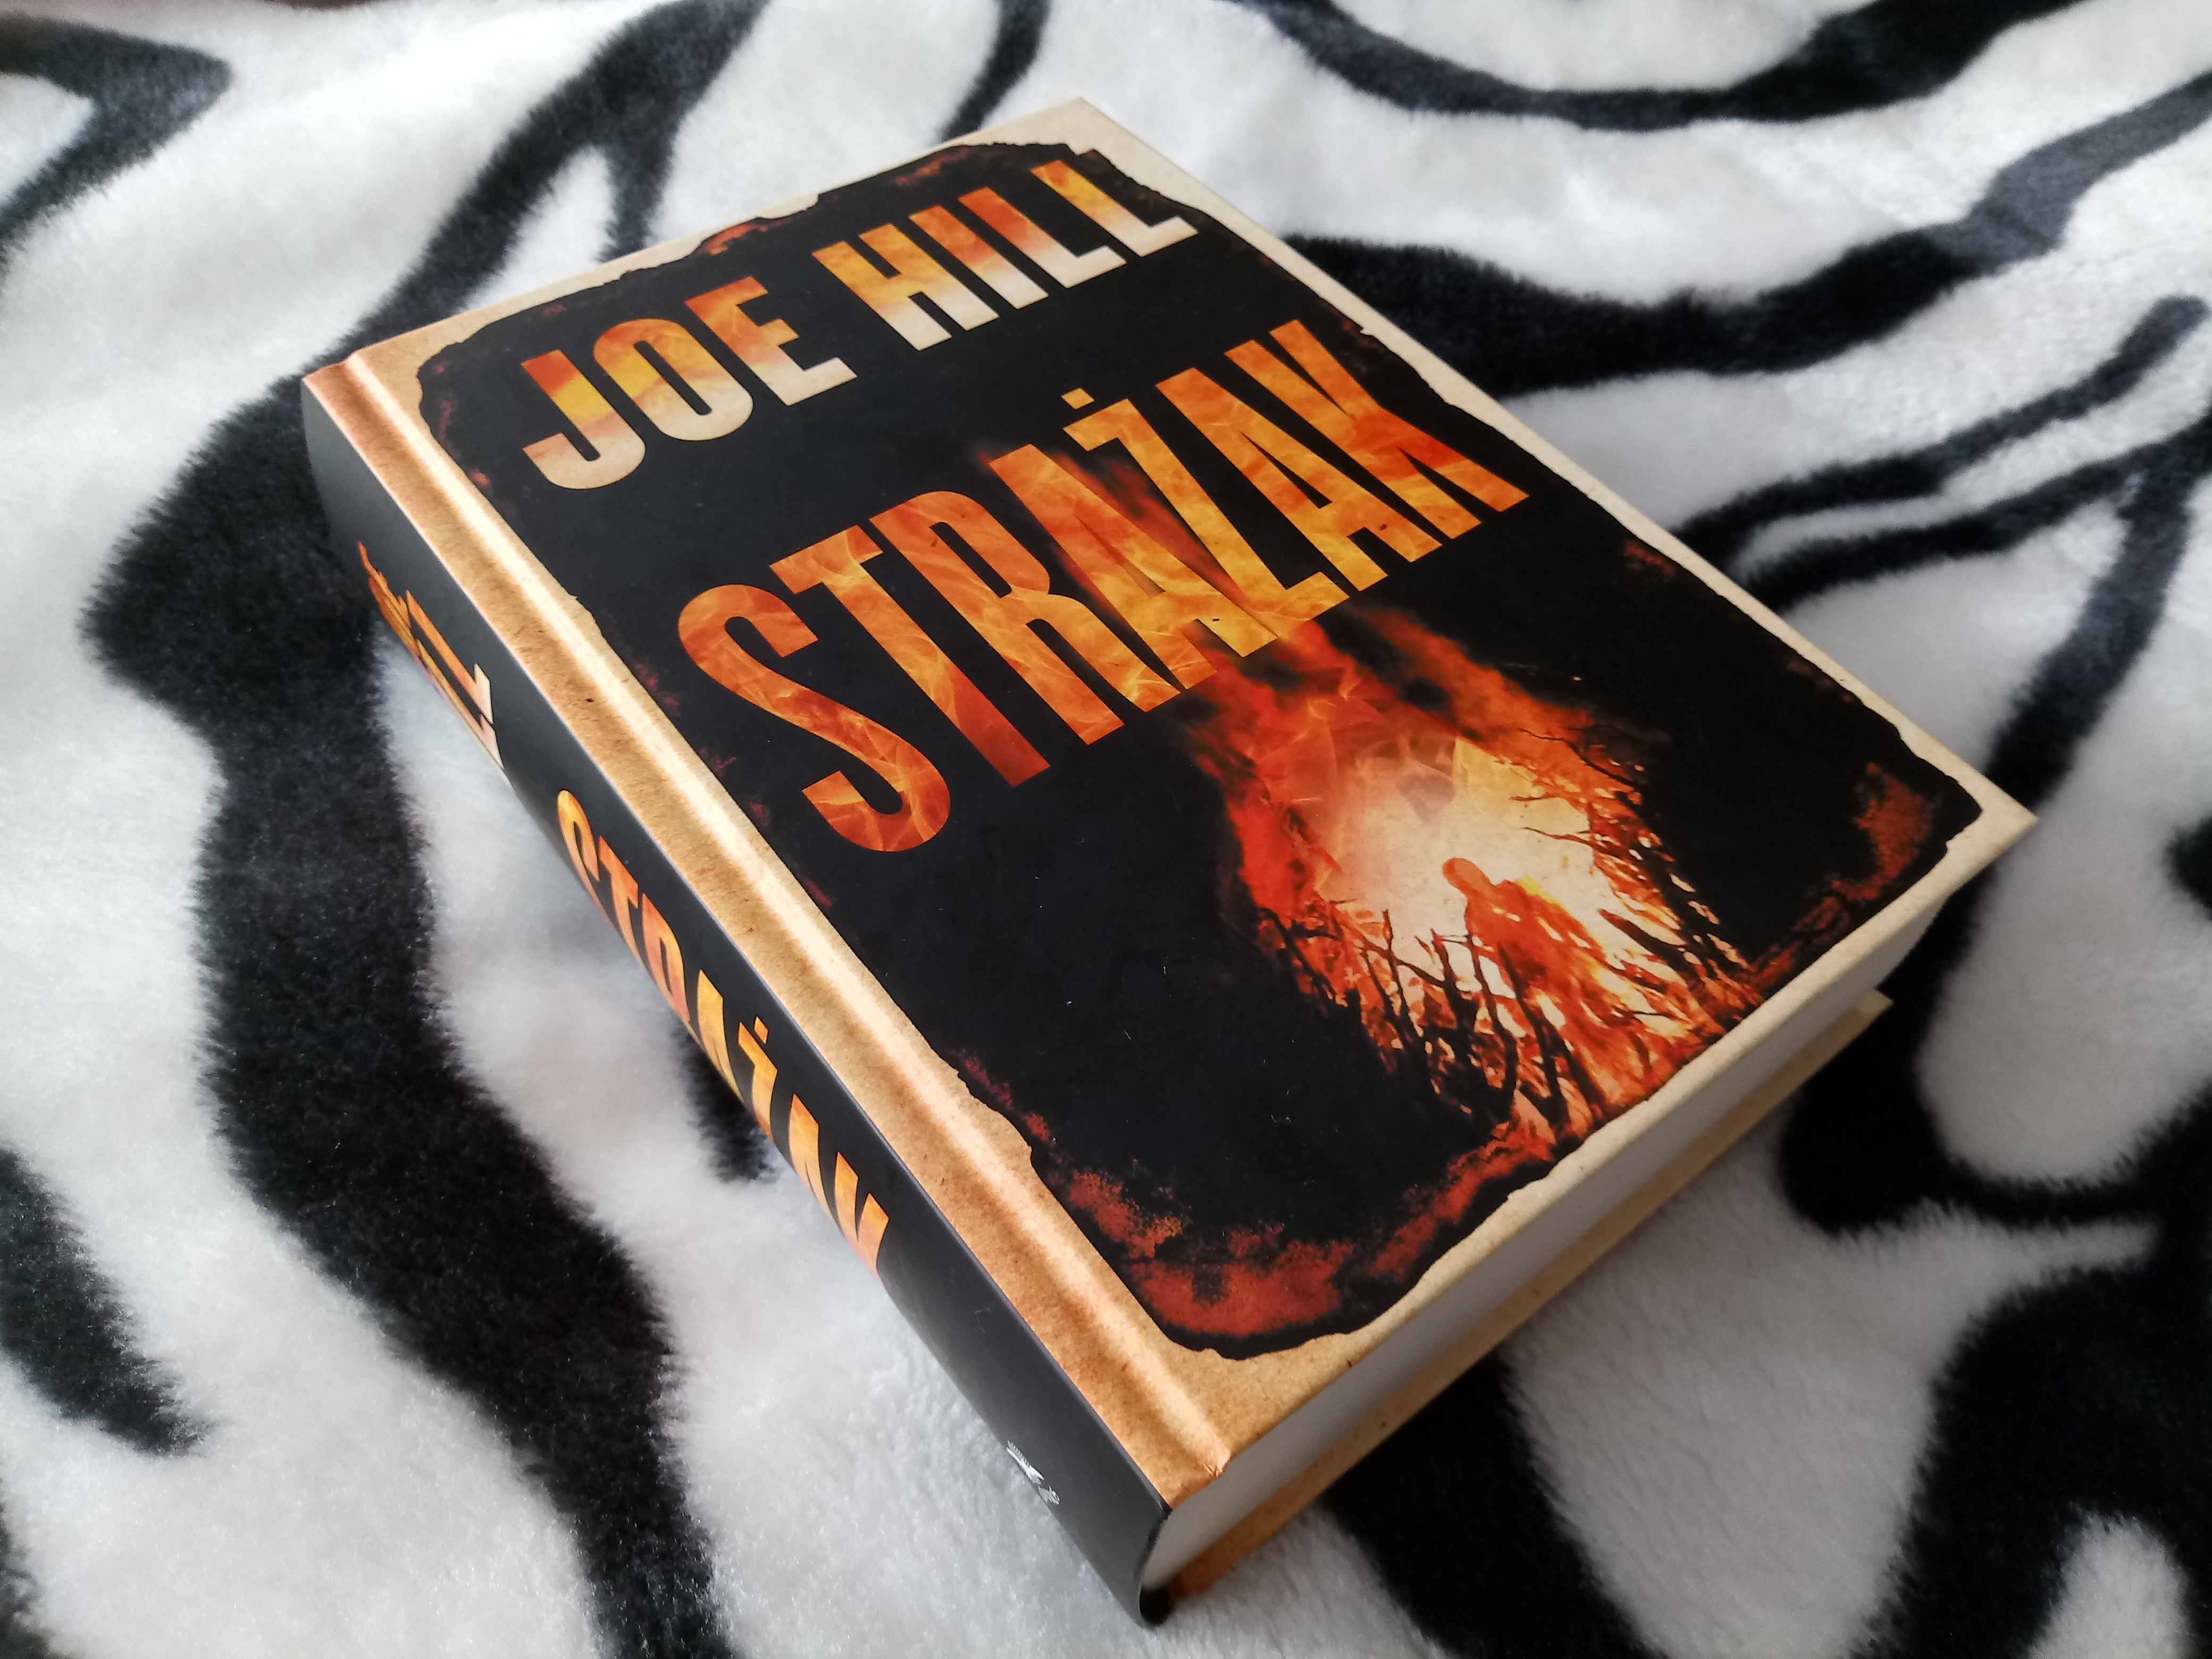 Strażak – Joe Hill